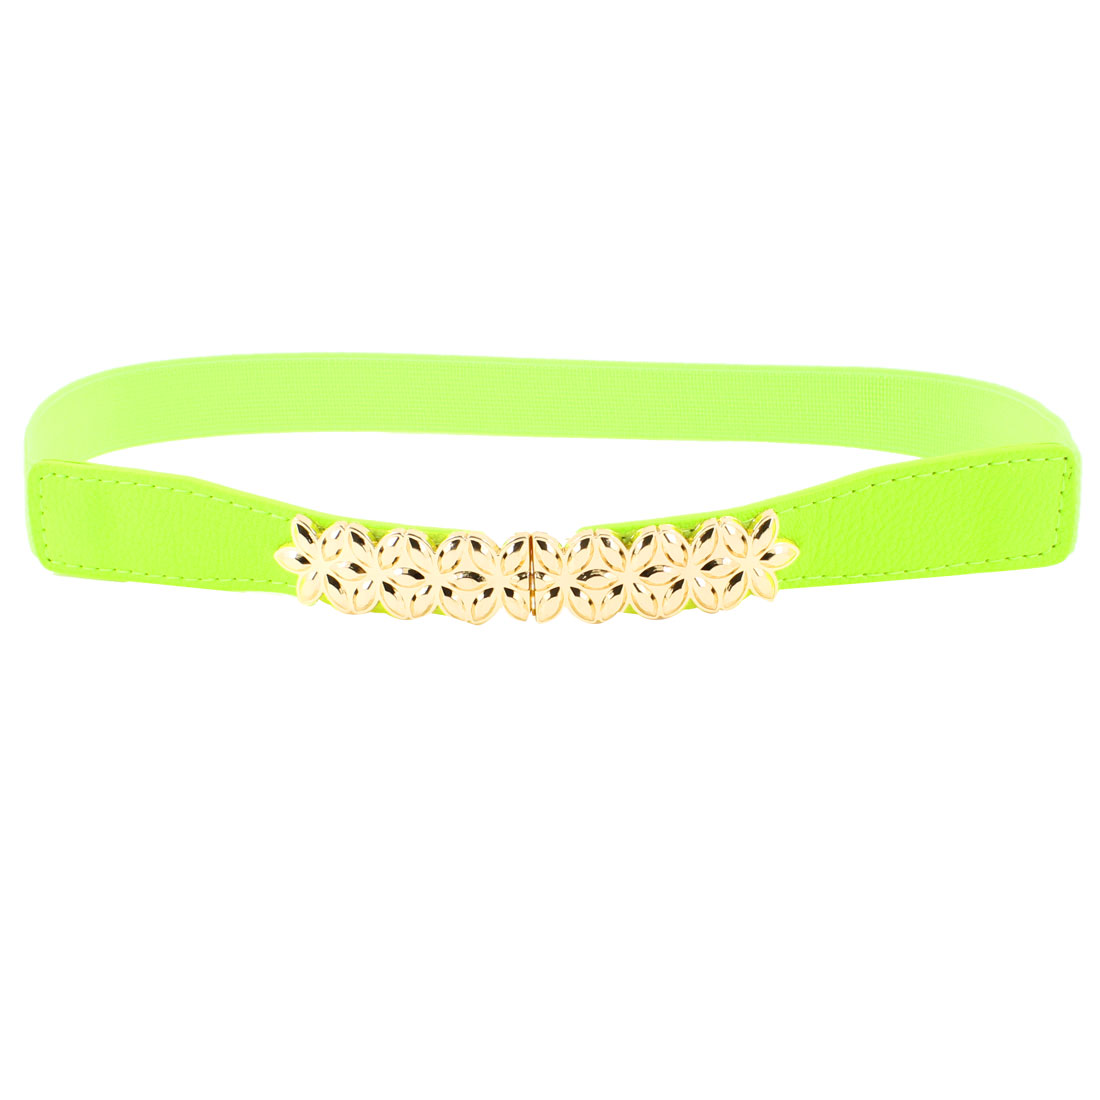 Gold Tone Metal Flower Decor Lime Elastic Skinny Waist Band Belt for Lady